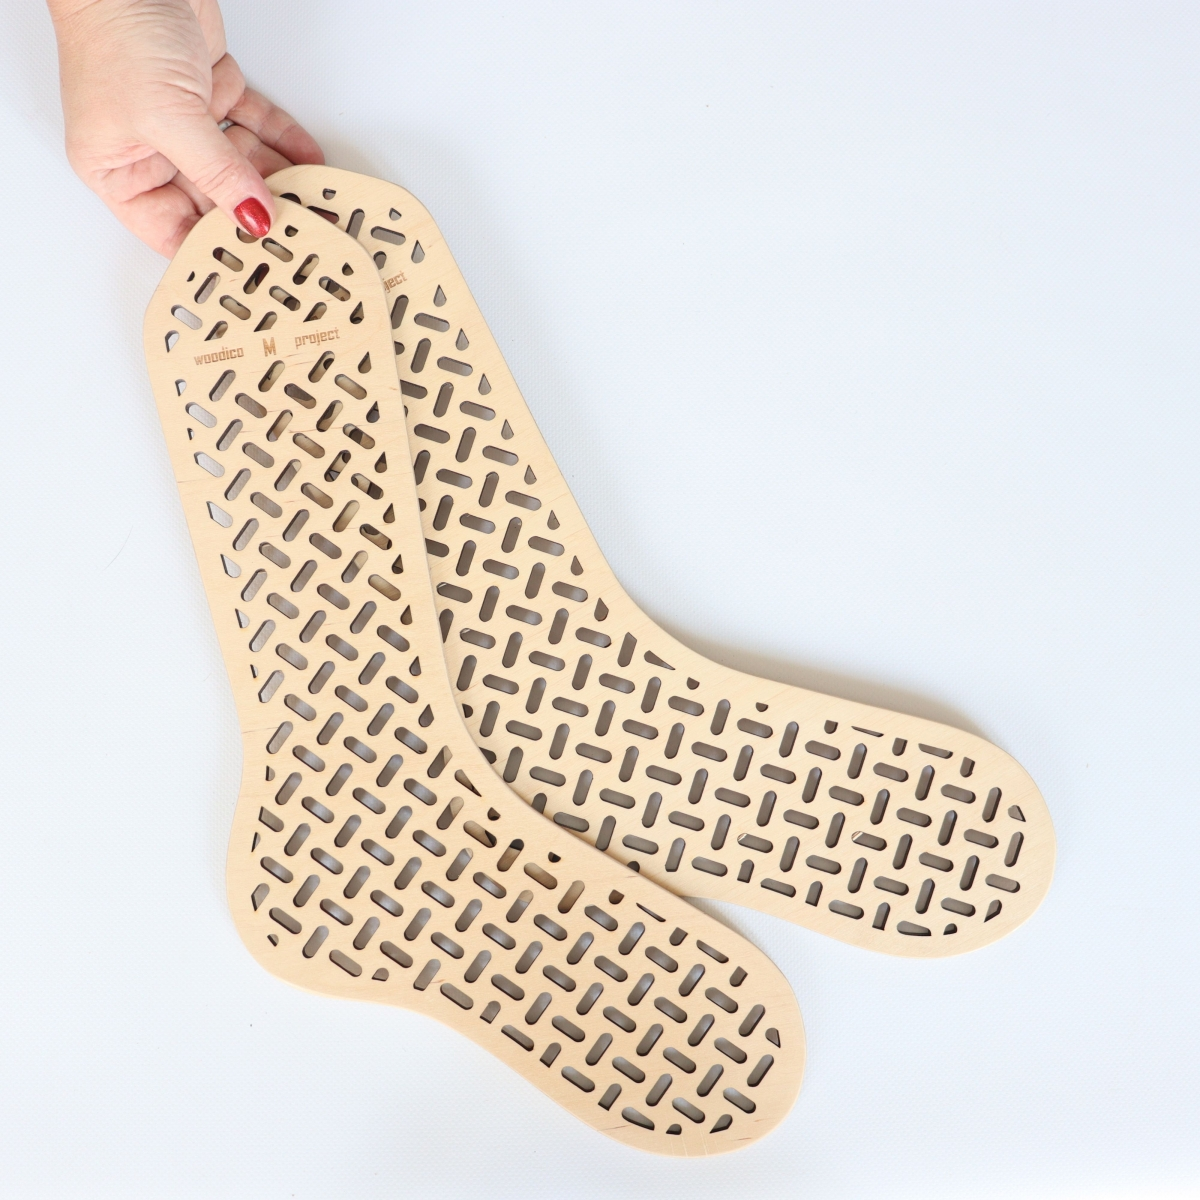 woodico.pro wooden sock blockers stitches 6 1200x1200 - Wooden sock blockers / Stitches